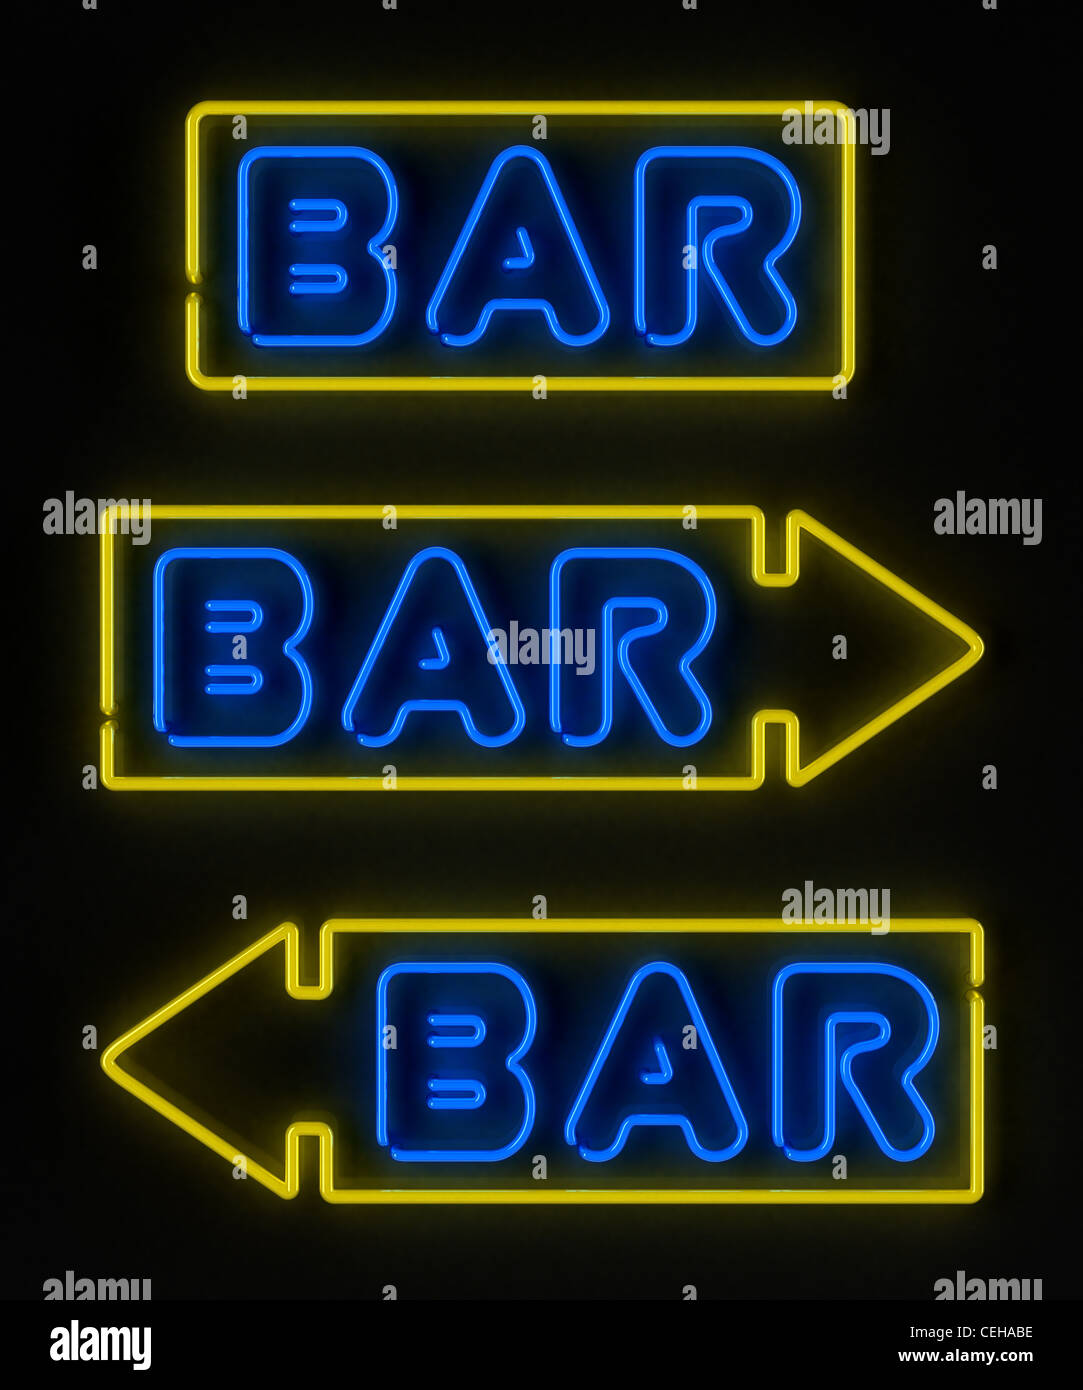 Neon bar sign - Stock Image